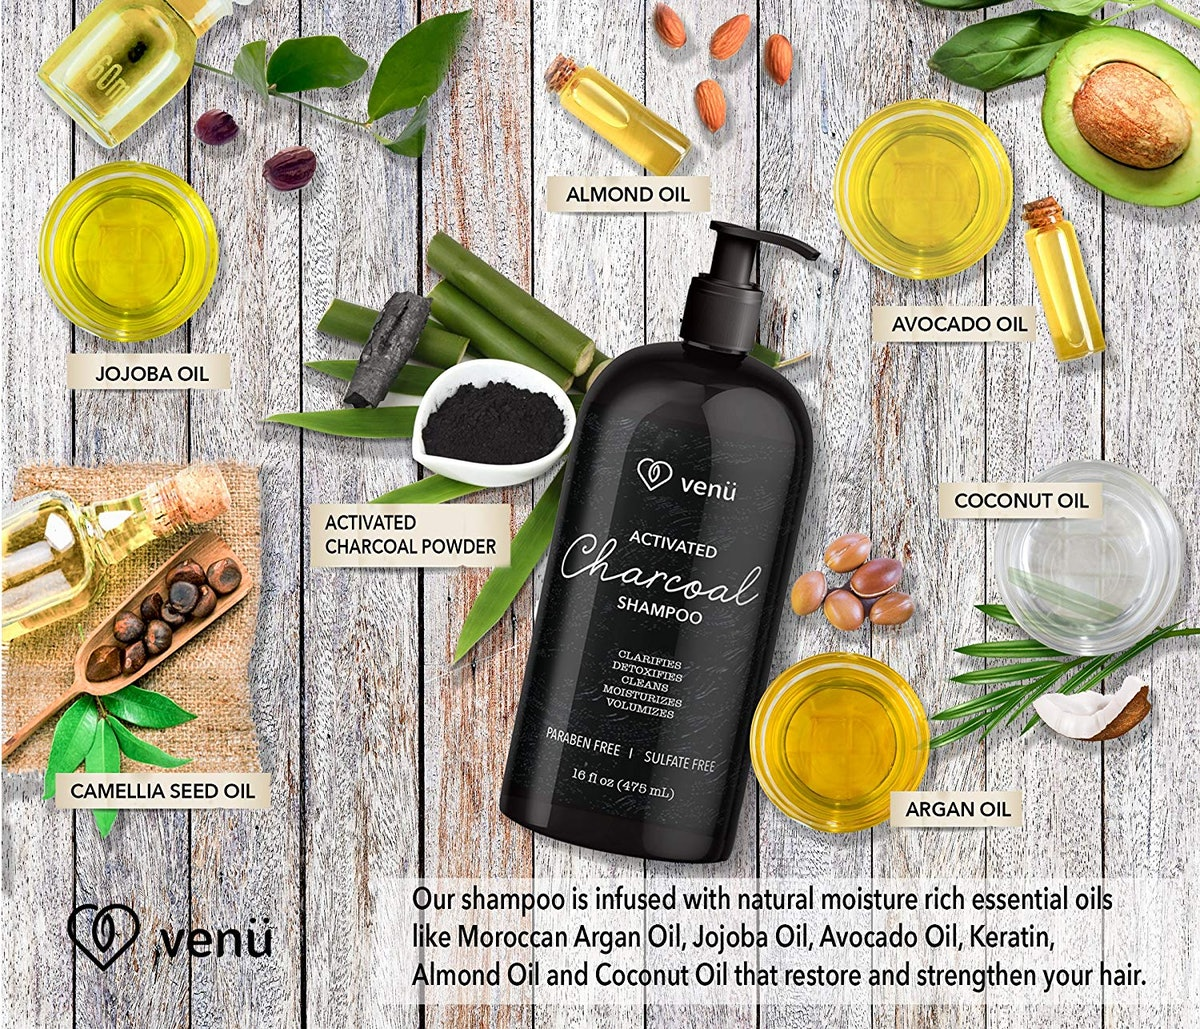 Venu Activated Charcoal Shampoo